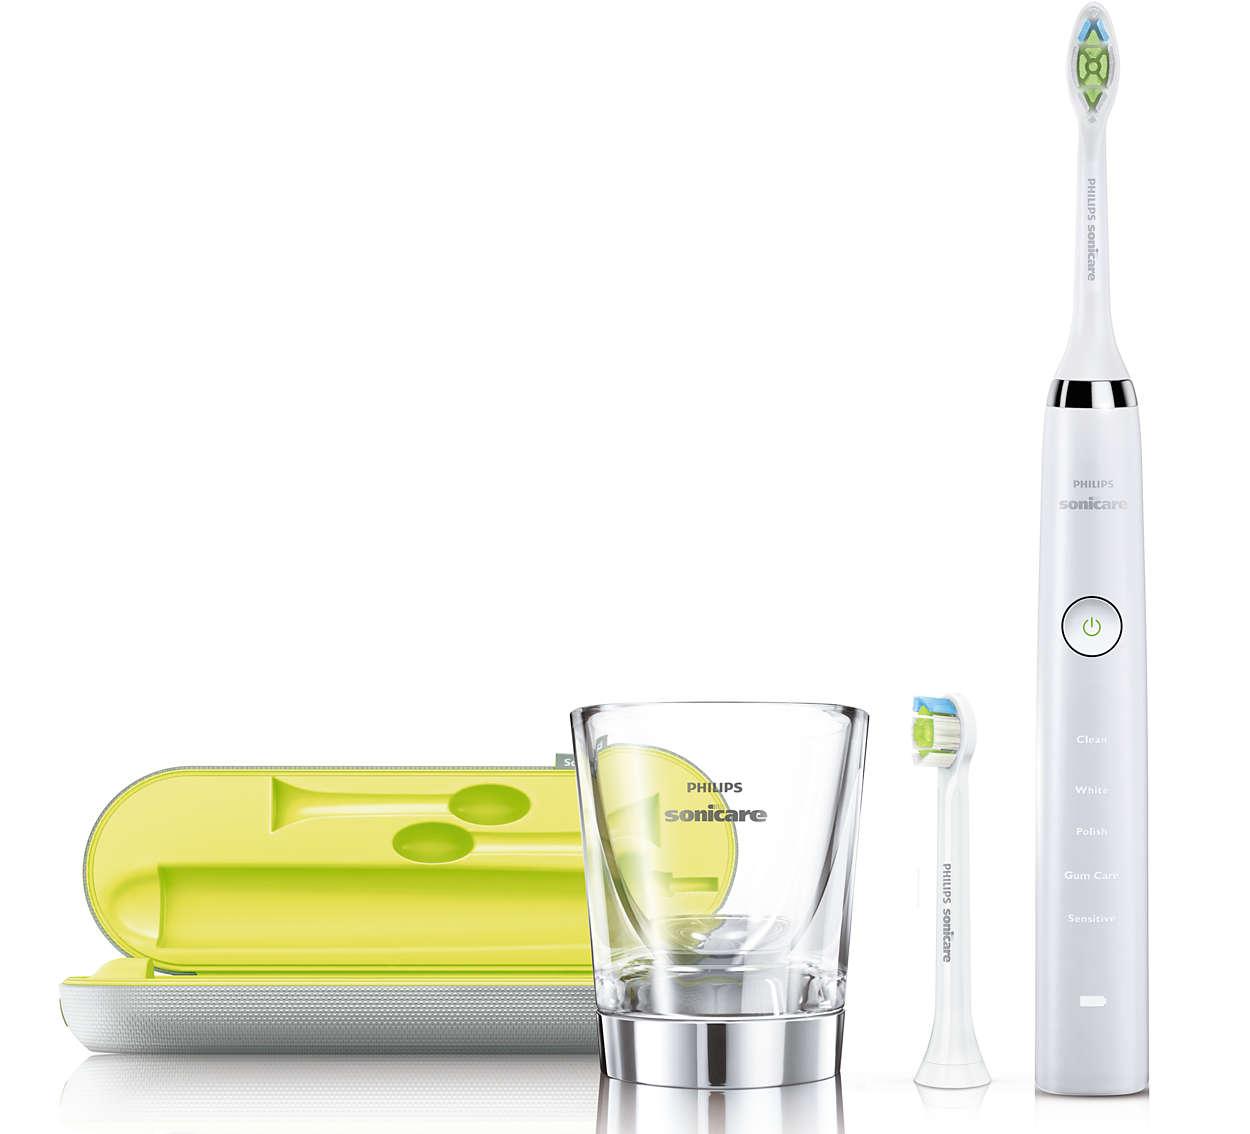 Sonicare DiamondClean Toothbrush